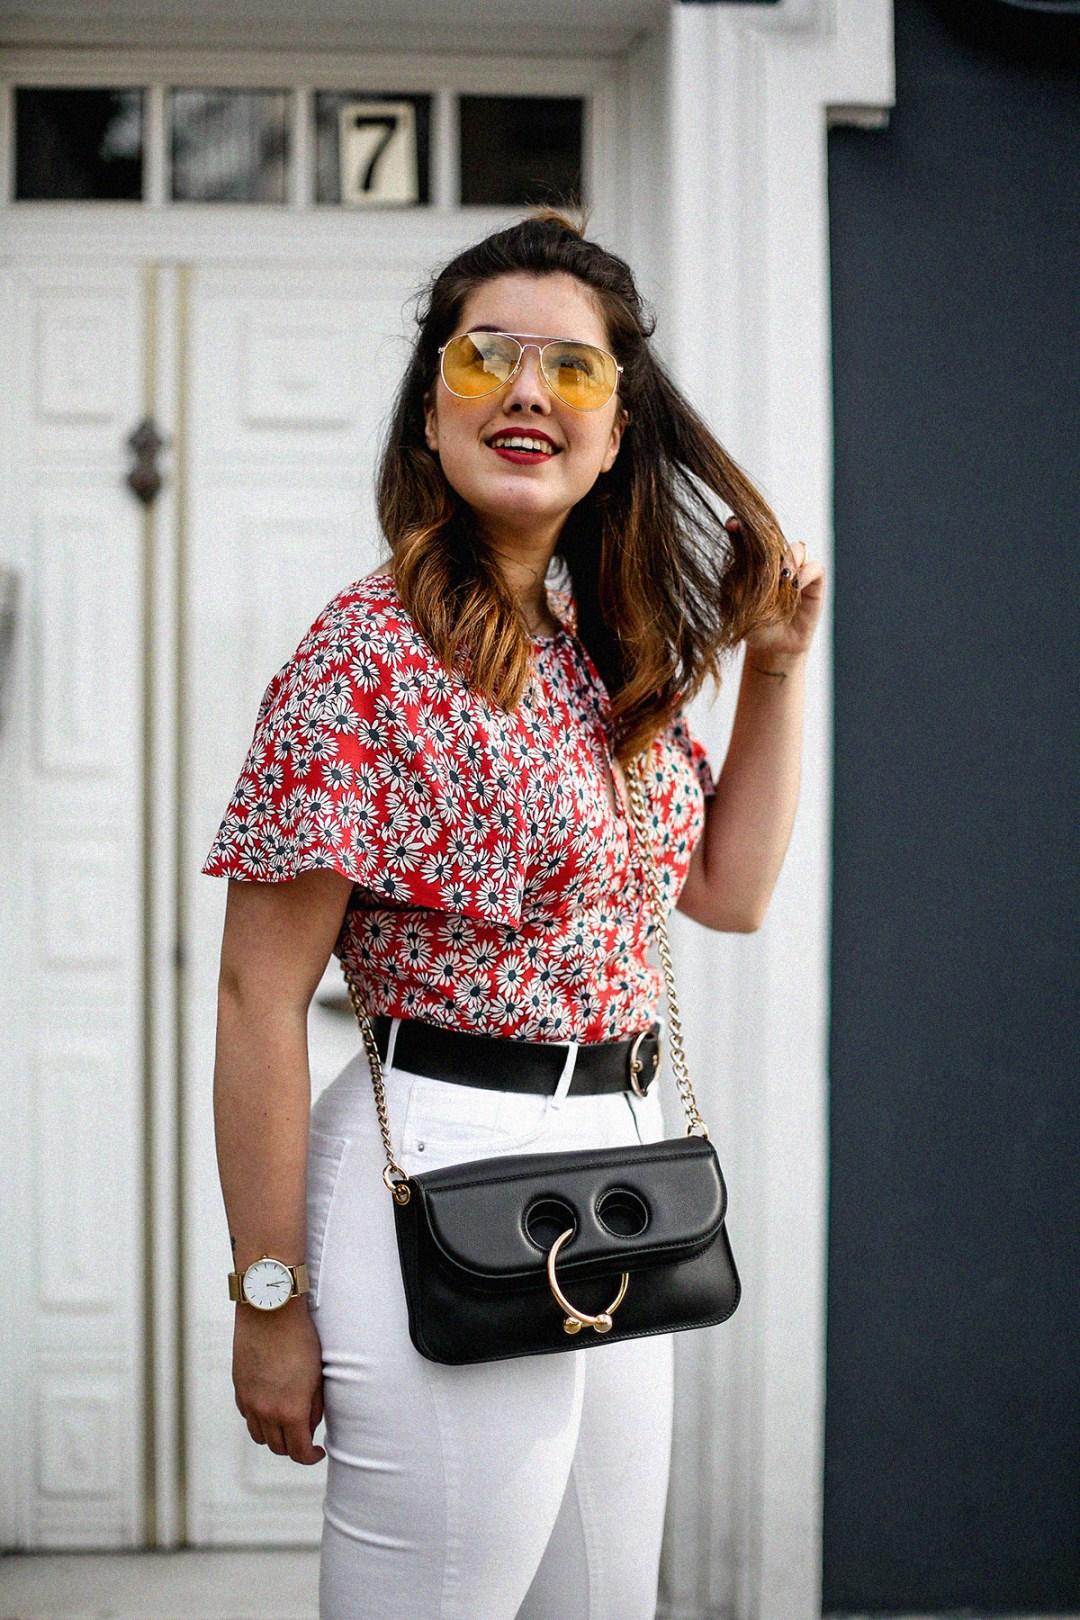 flower-top-zara-frayed-white-jeans-chanel-slingback-jw-anderson-bag-streetstyle4